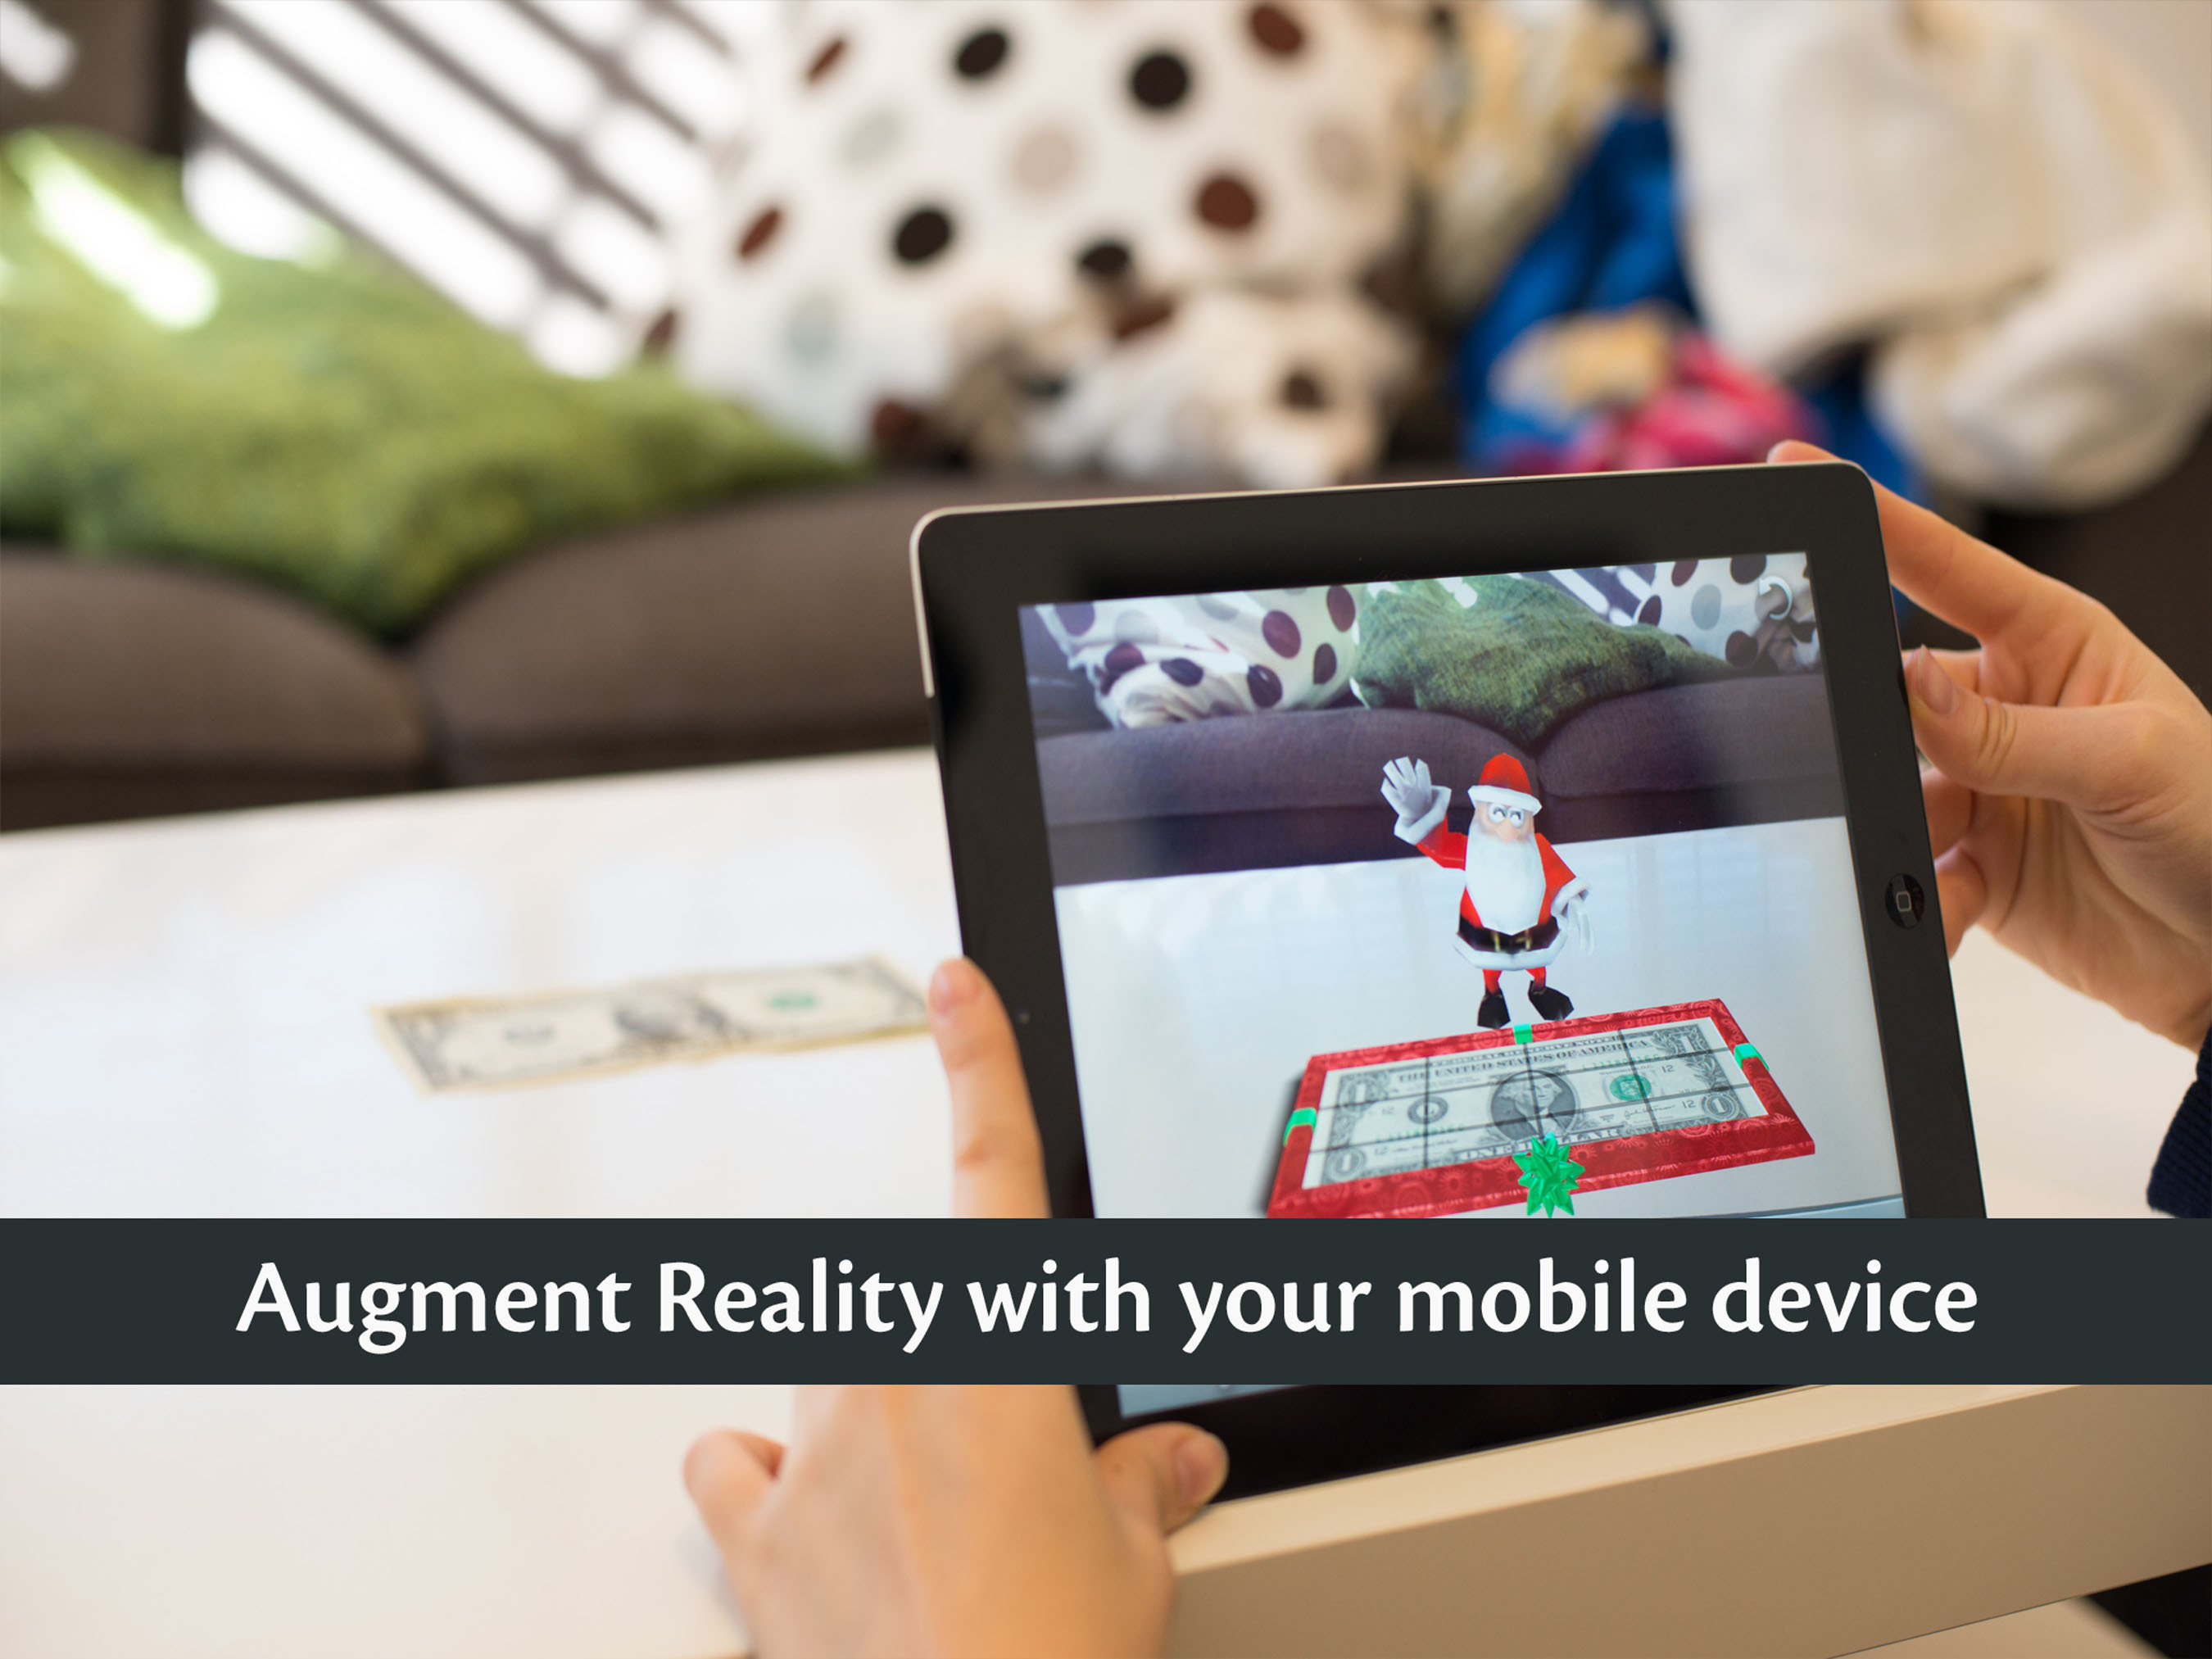 Augment Reality with your mobile device.  (PRNewsFoto/Jerusalem.com)